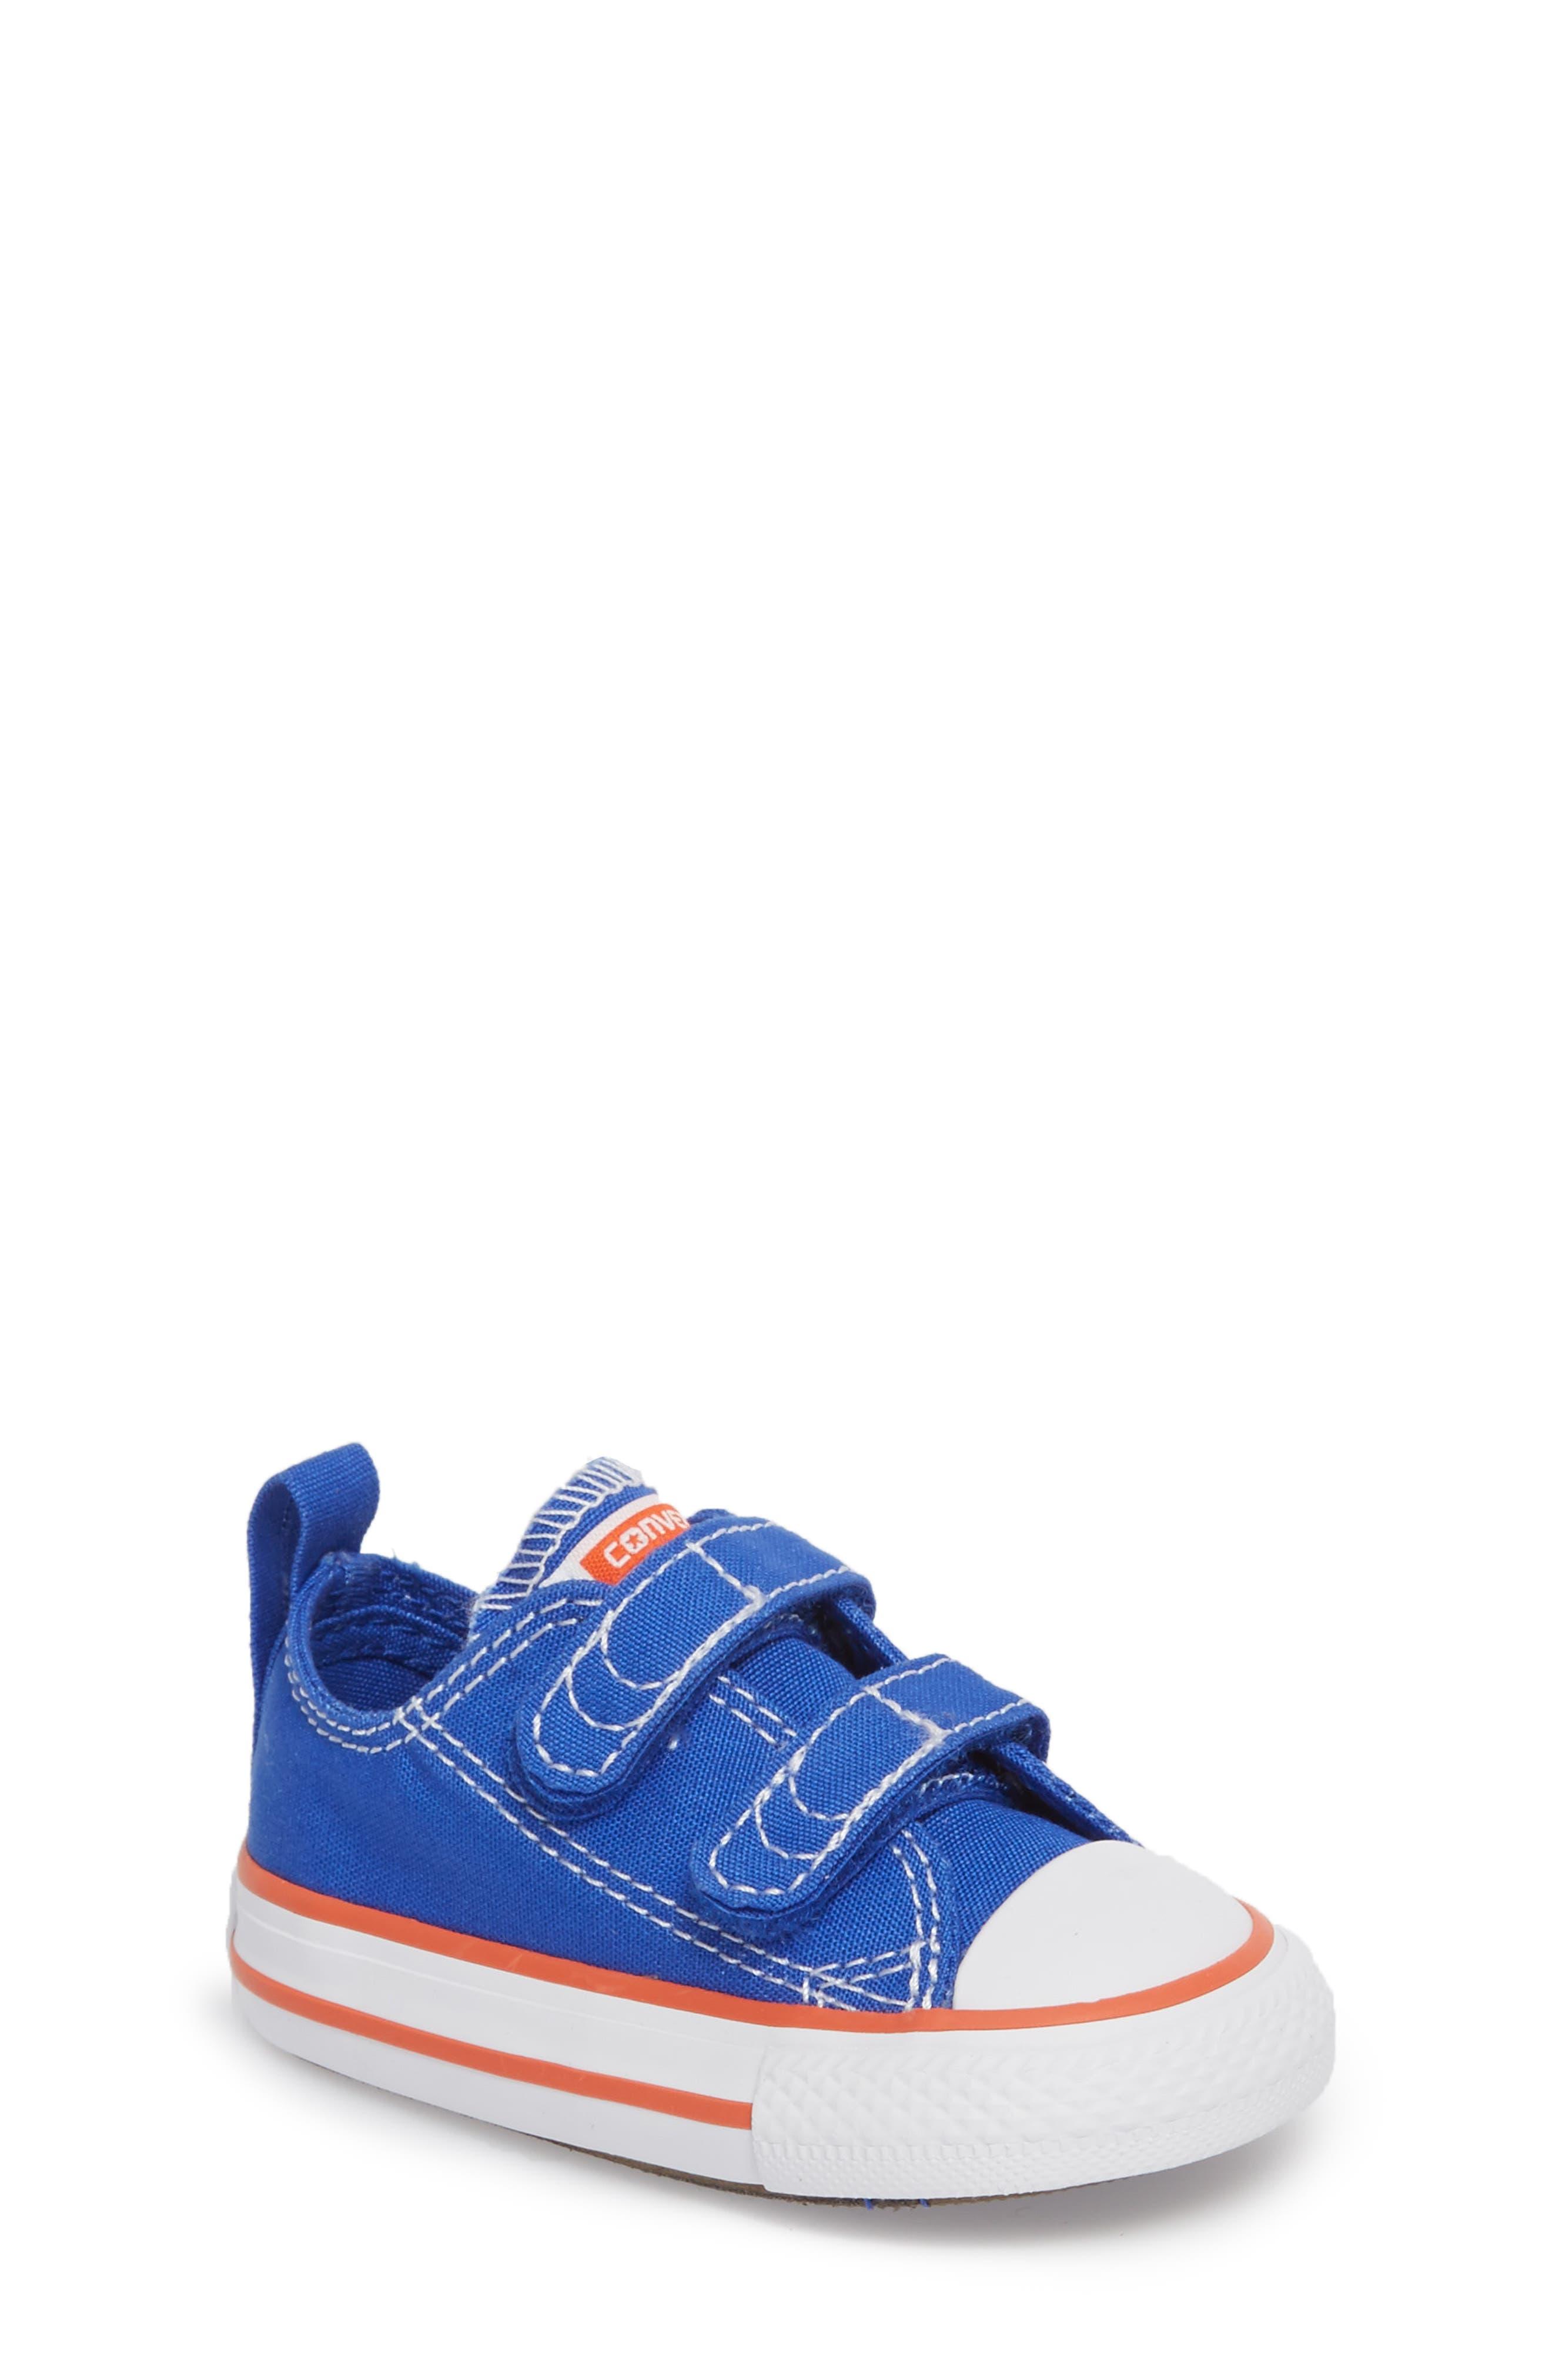 Chuck Taylor<sup>®</sup> All Star<sup>®</sup> Seasonal 2V Low Top Sneaker,                             Main thumbnail 1, color,                             483